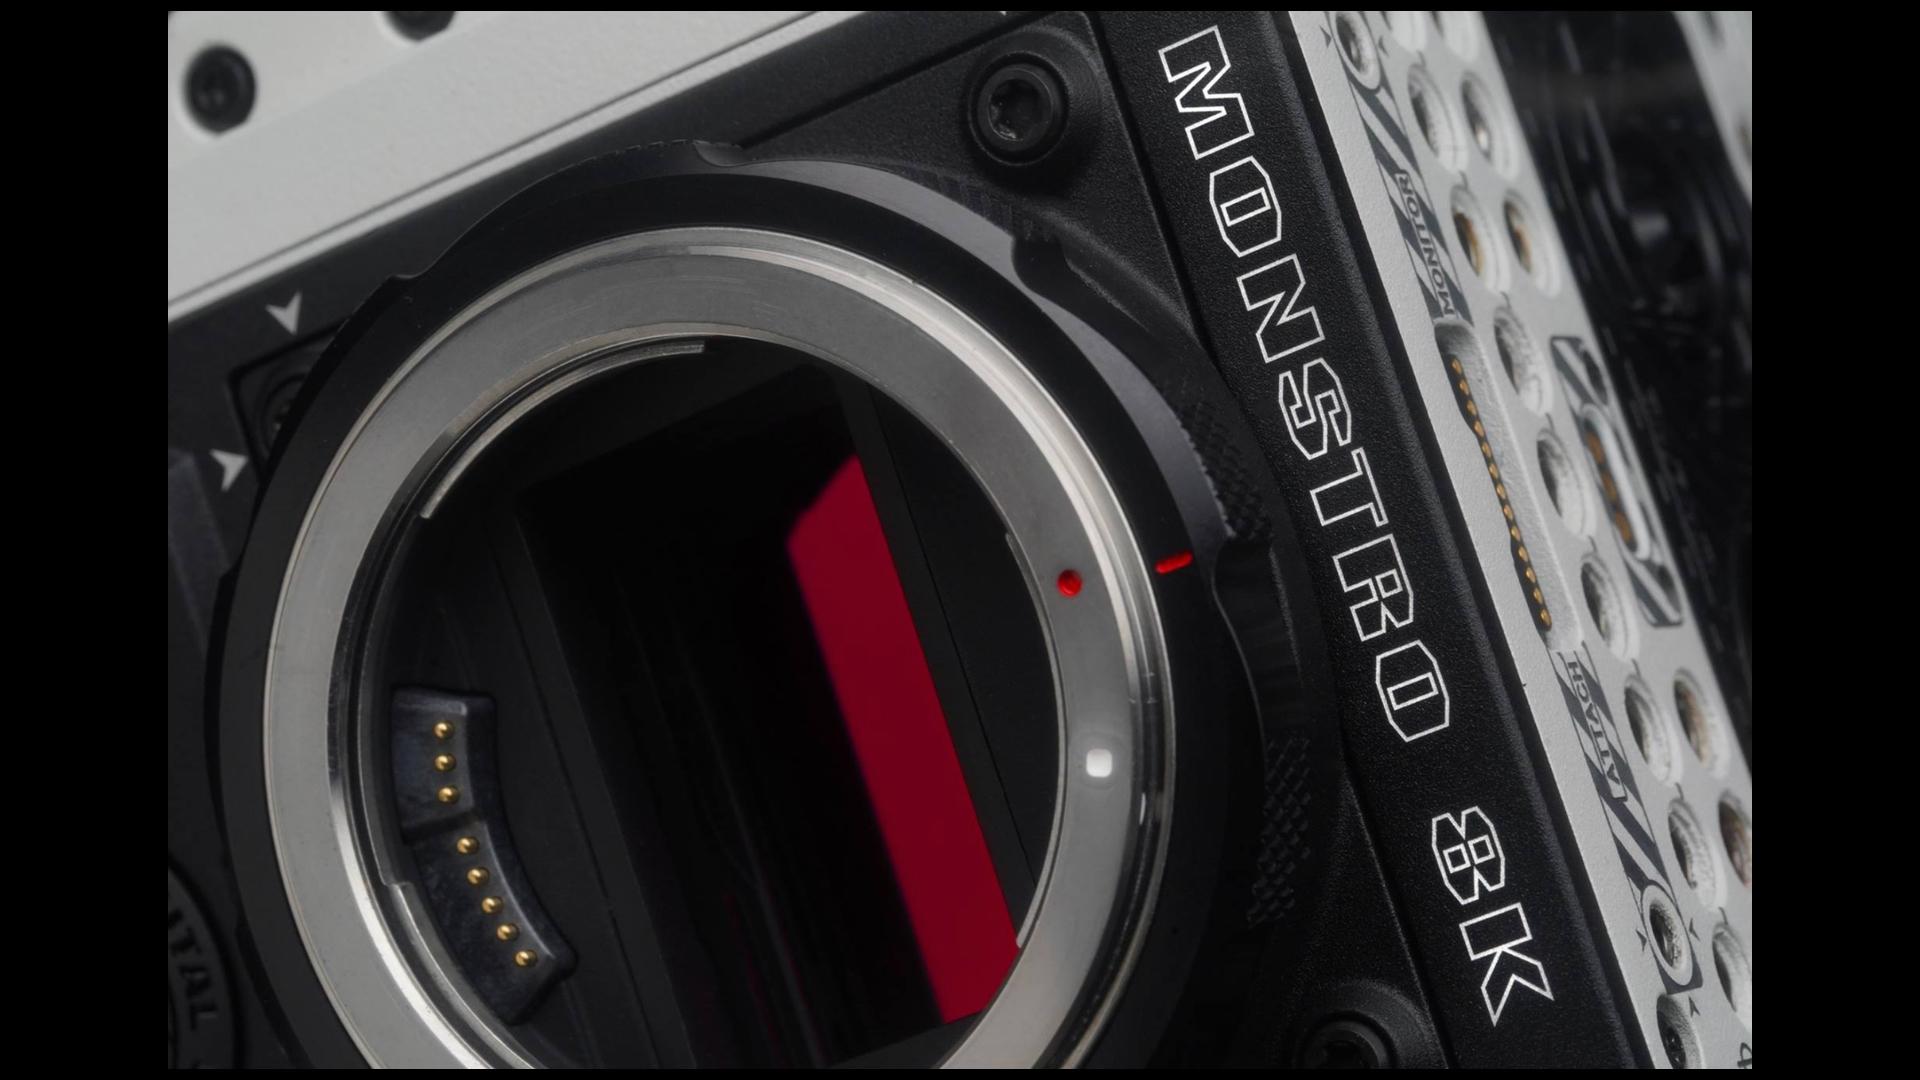 REDがMONSTRO 8K VVフルフレームセンサーを発表